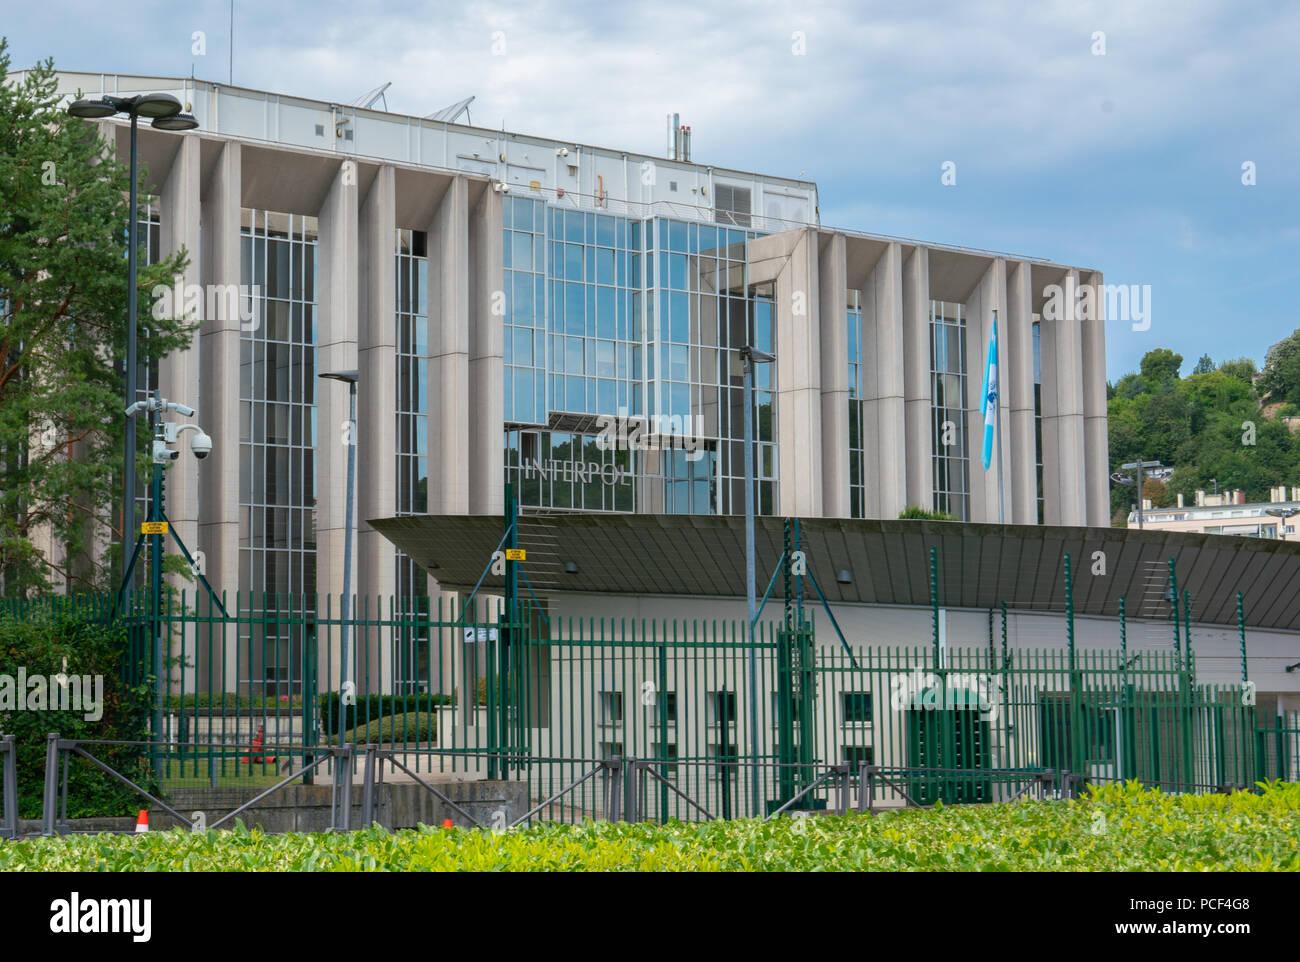 Interpol Stock Photos & Interpol Stock Images - Alamy